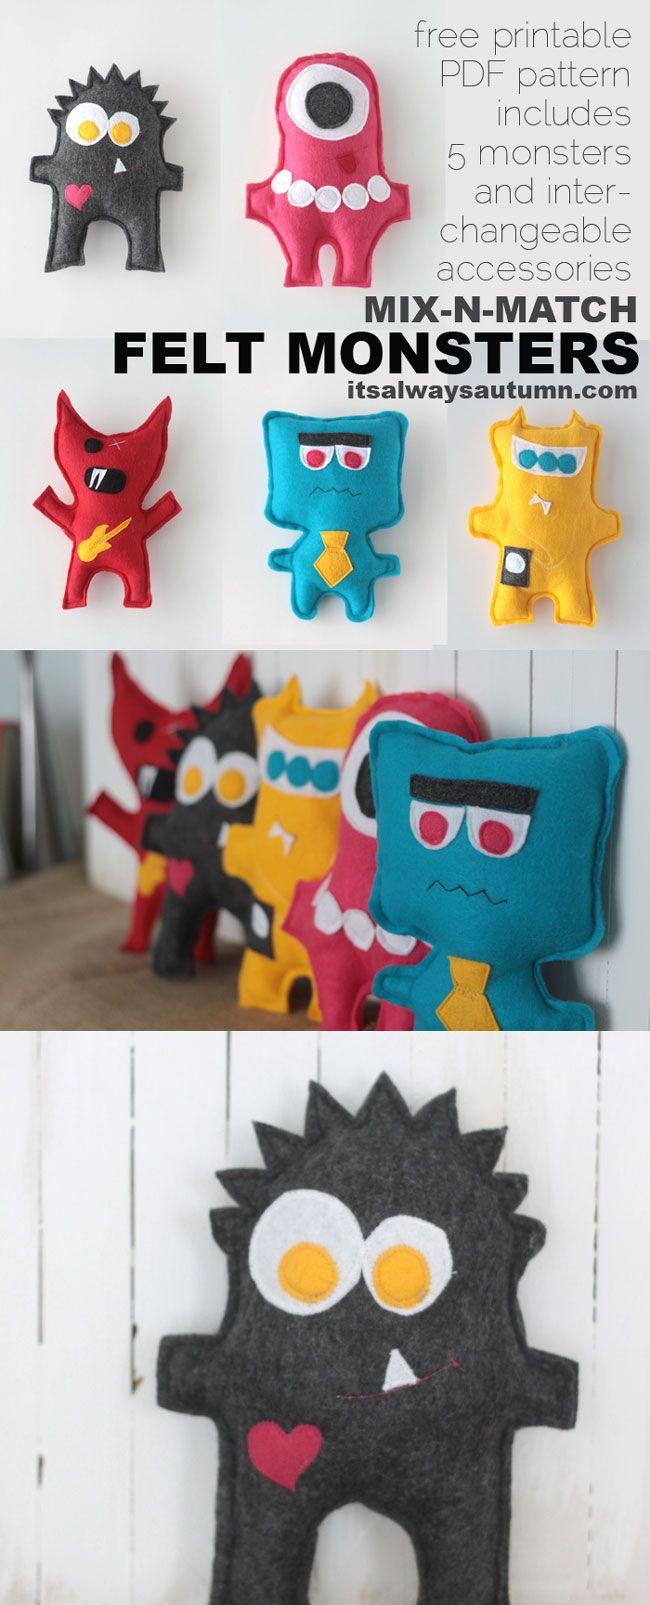 Christmas toys made of felt, patterns 32